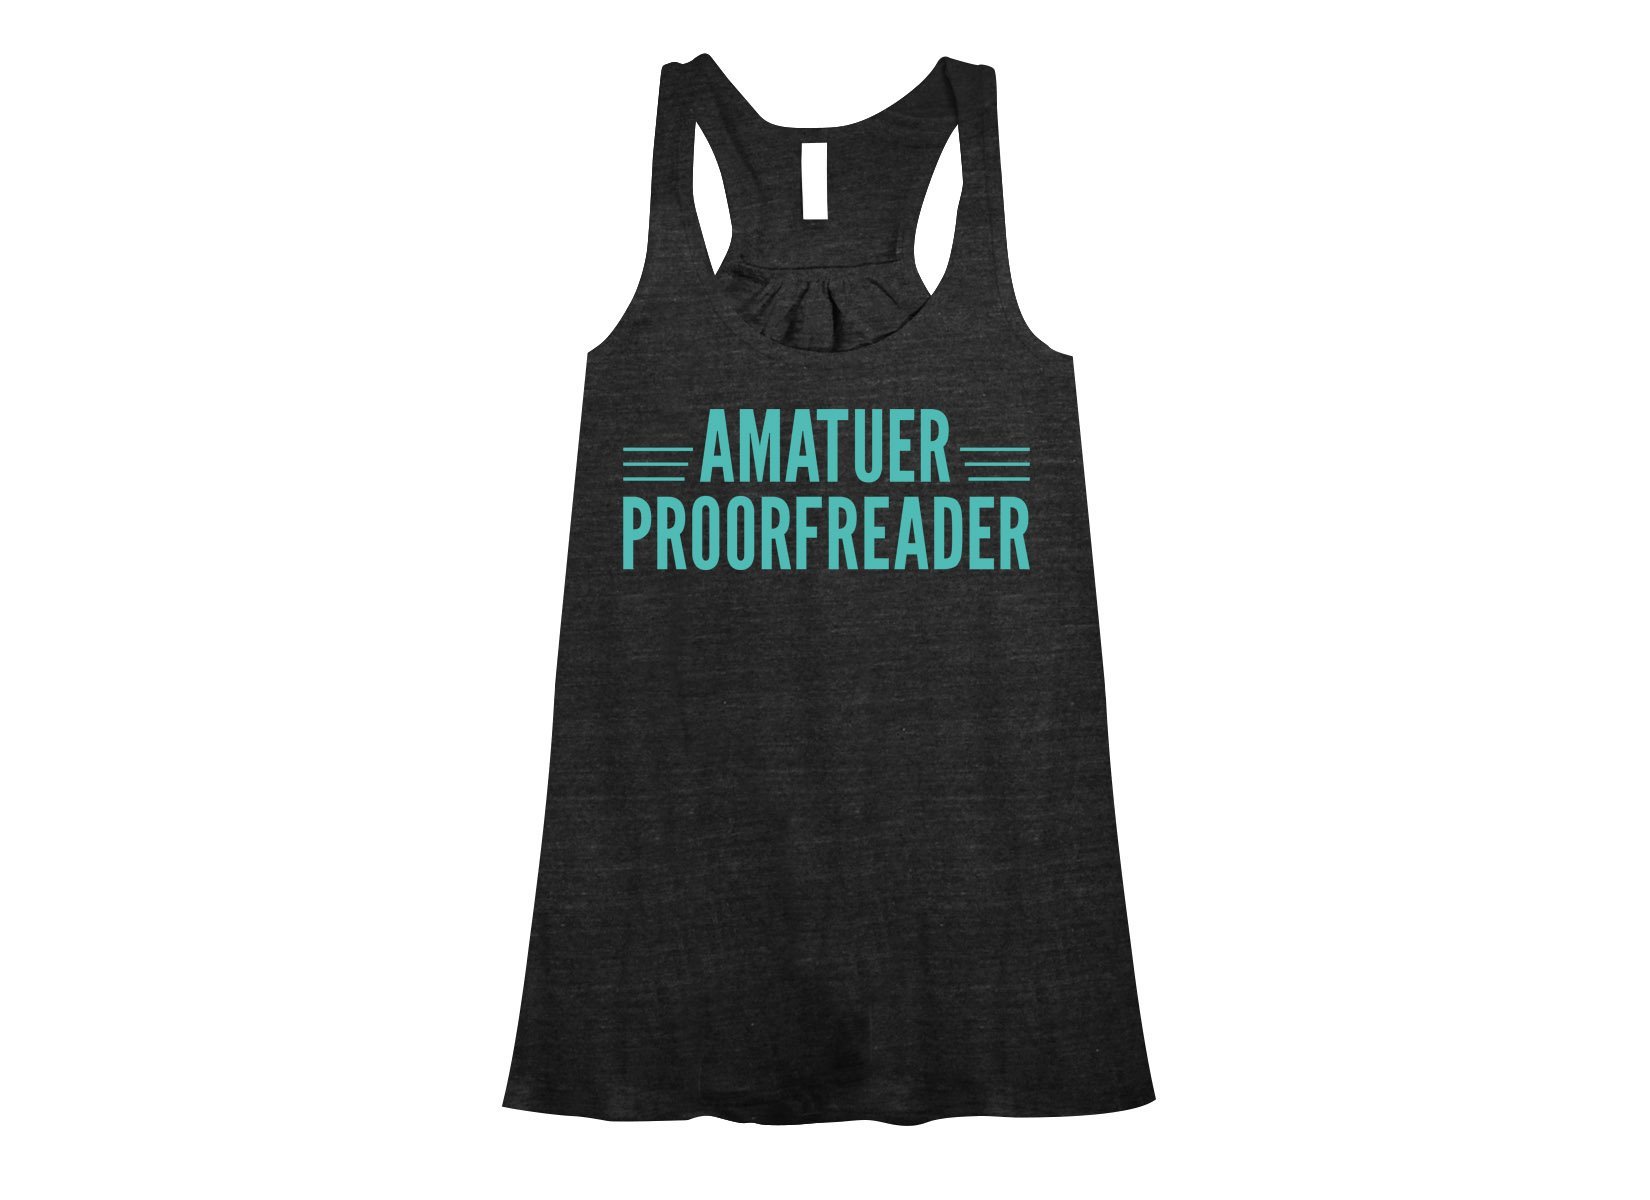 Amatuer Proorfeader on Womens Tanks T-Shirt